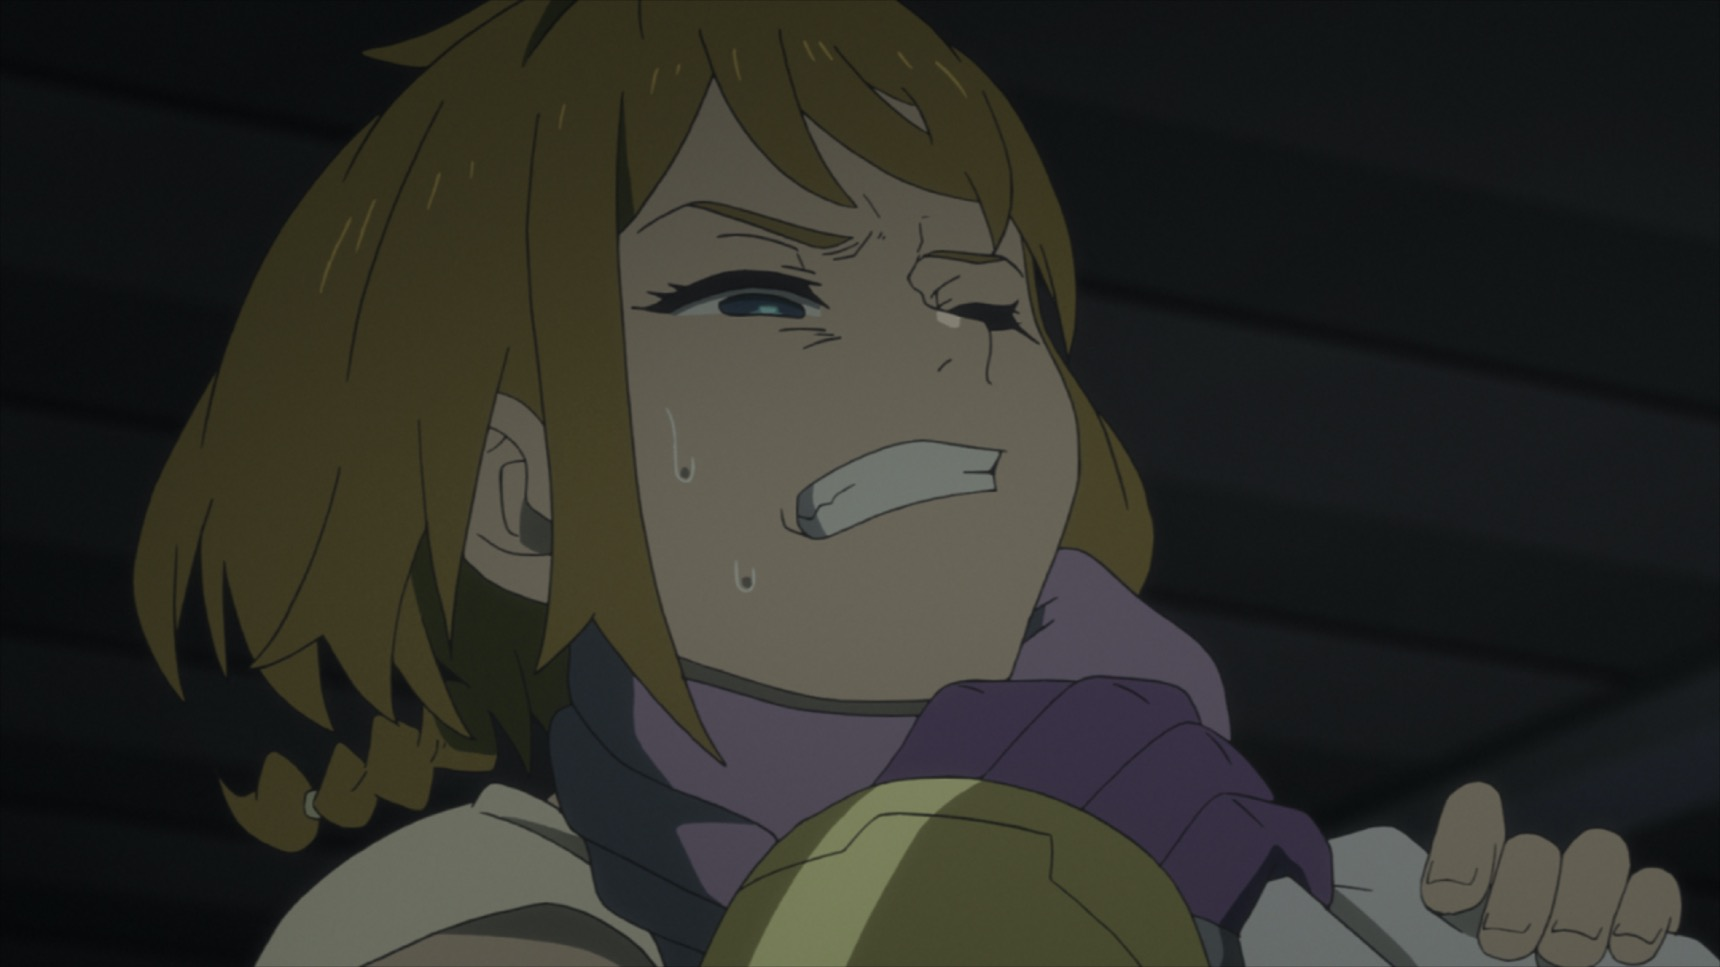 http://decadence-anime.com/assets/story/11_1.jpg